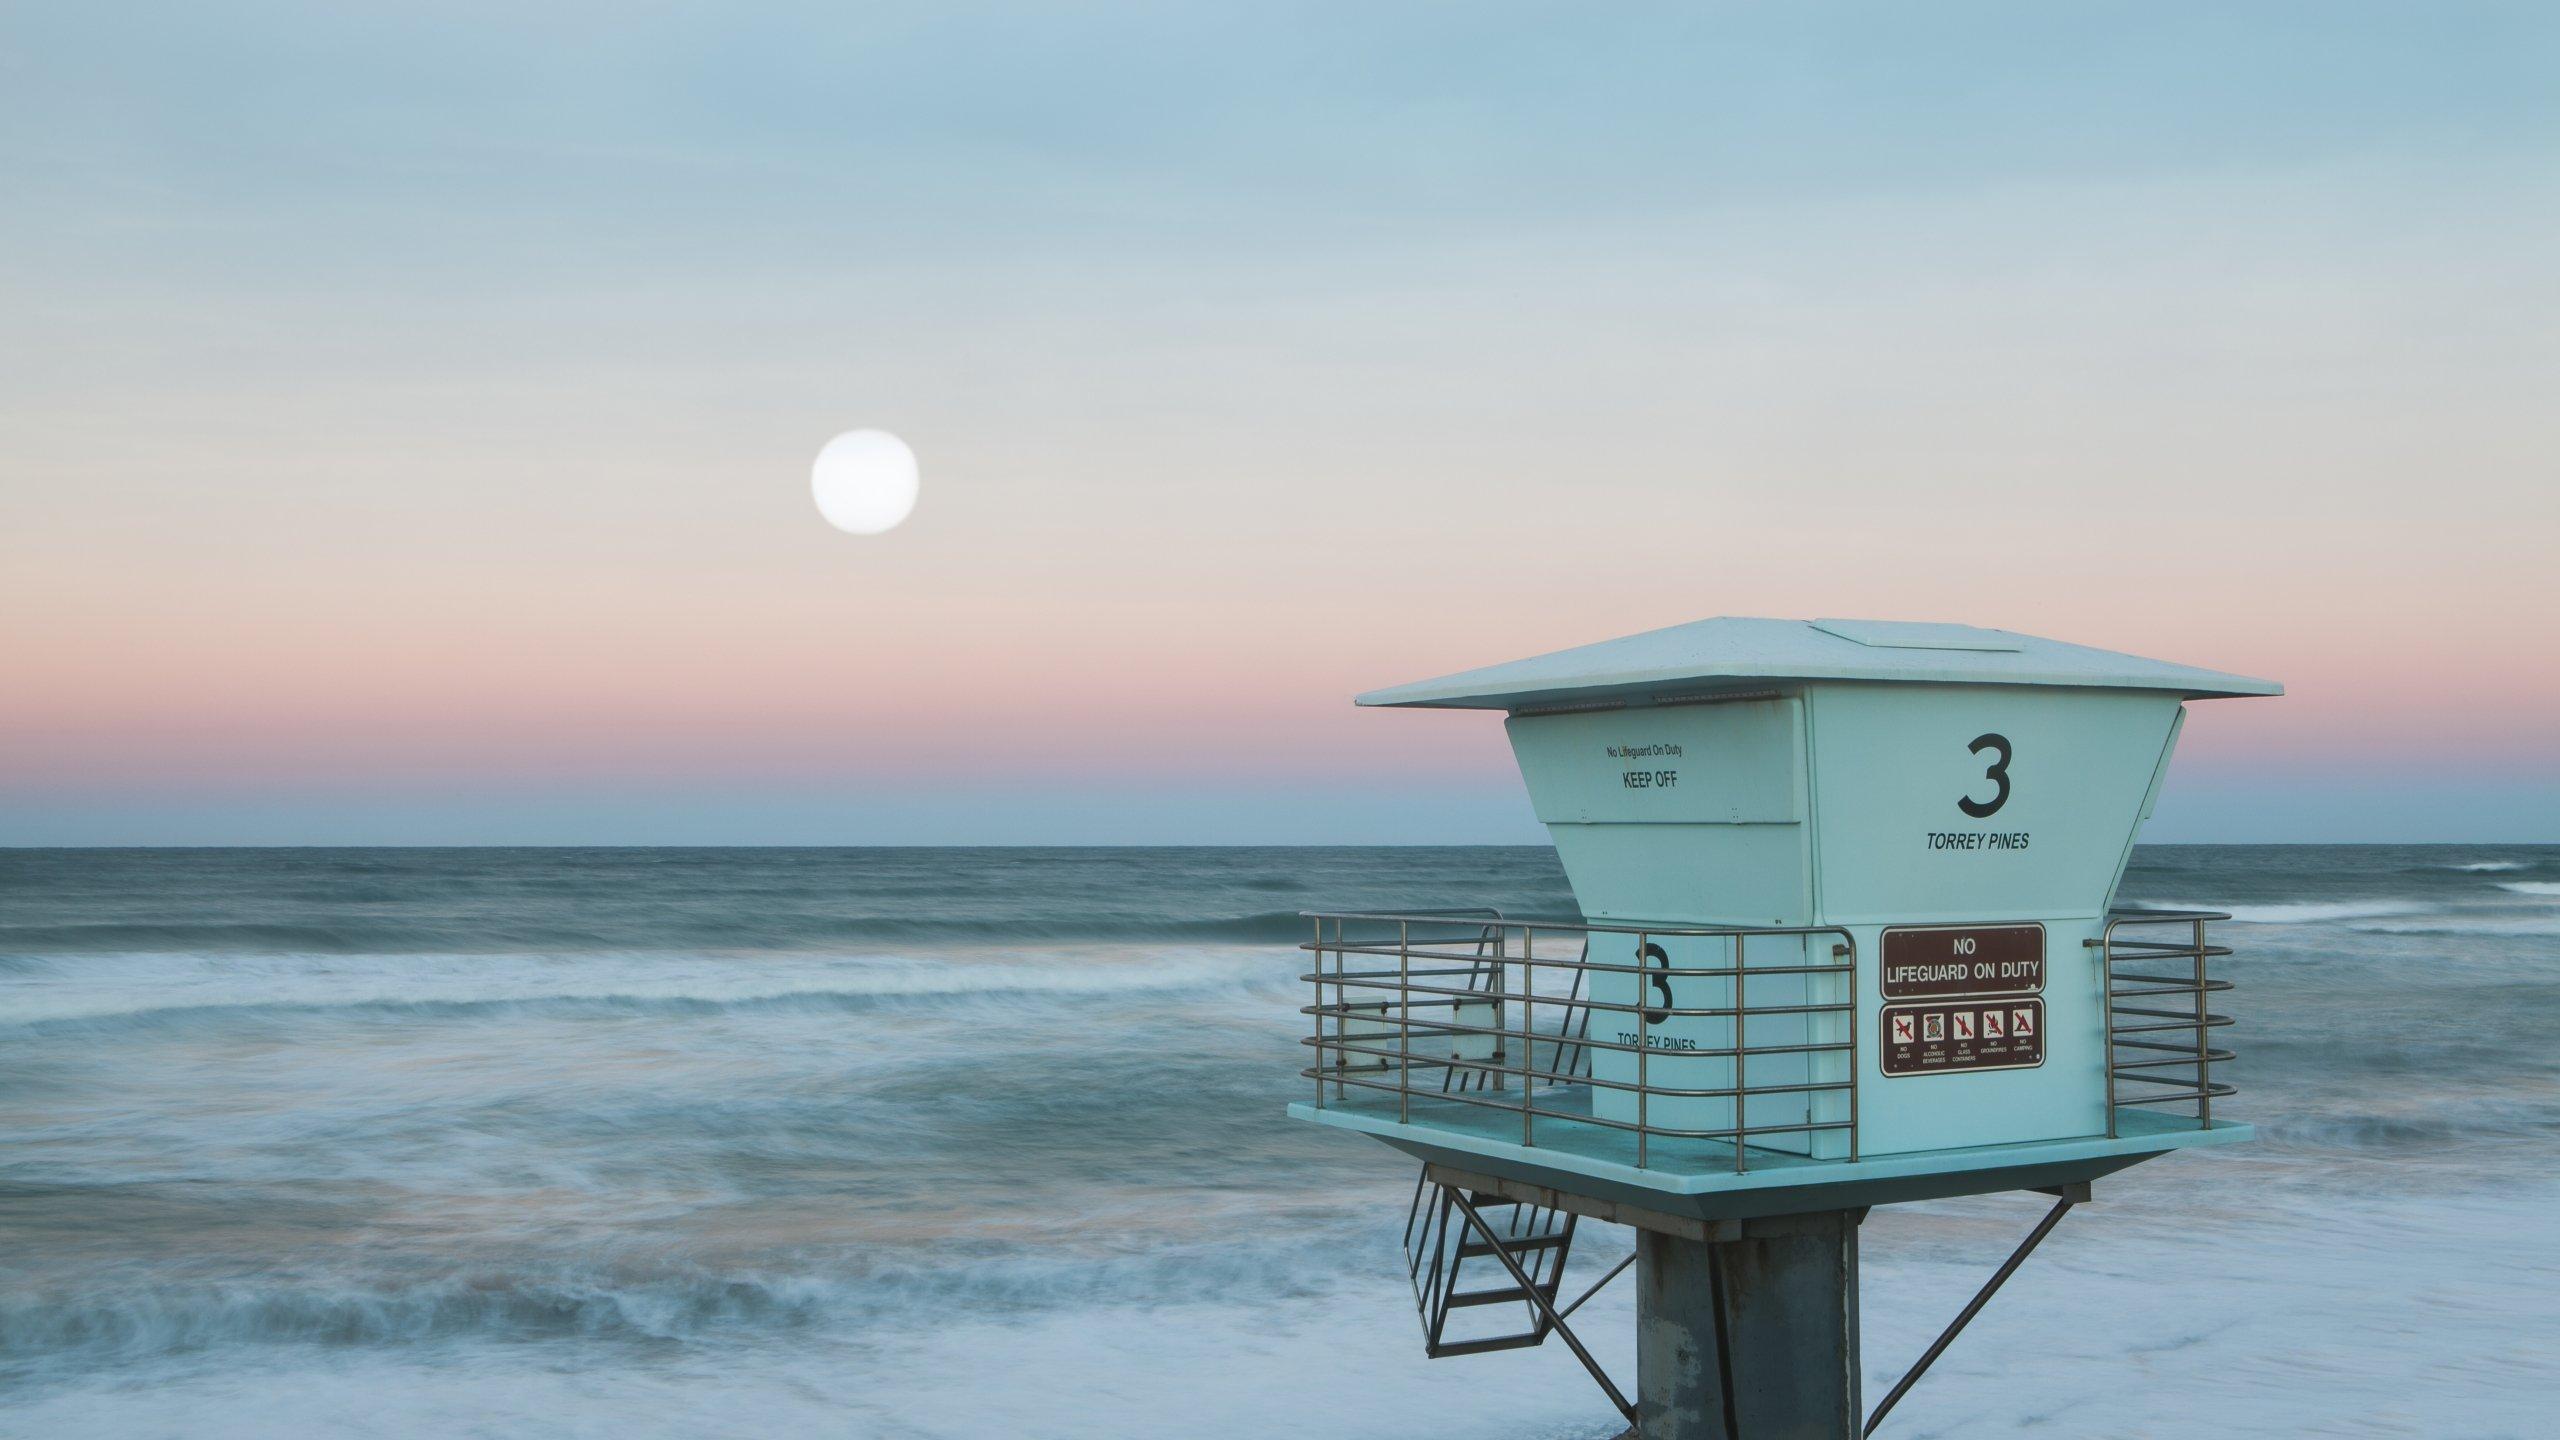 Pink Moonset - Pacific Ocean San Diego, California